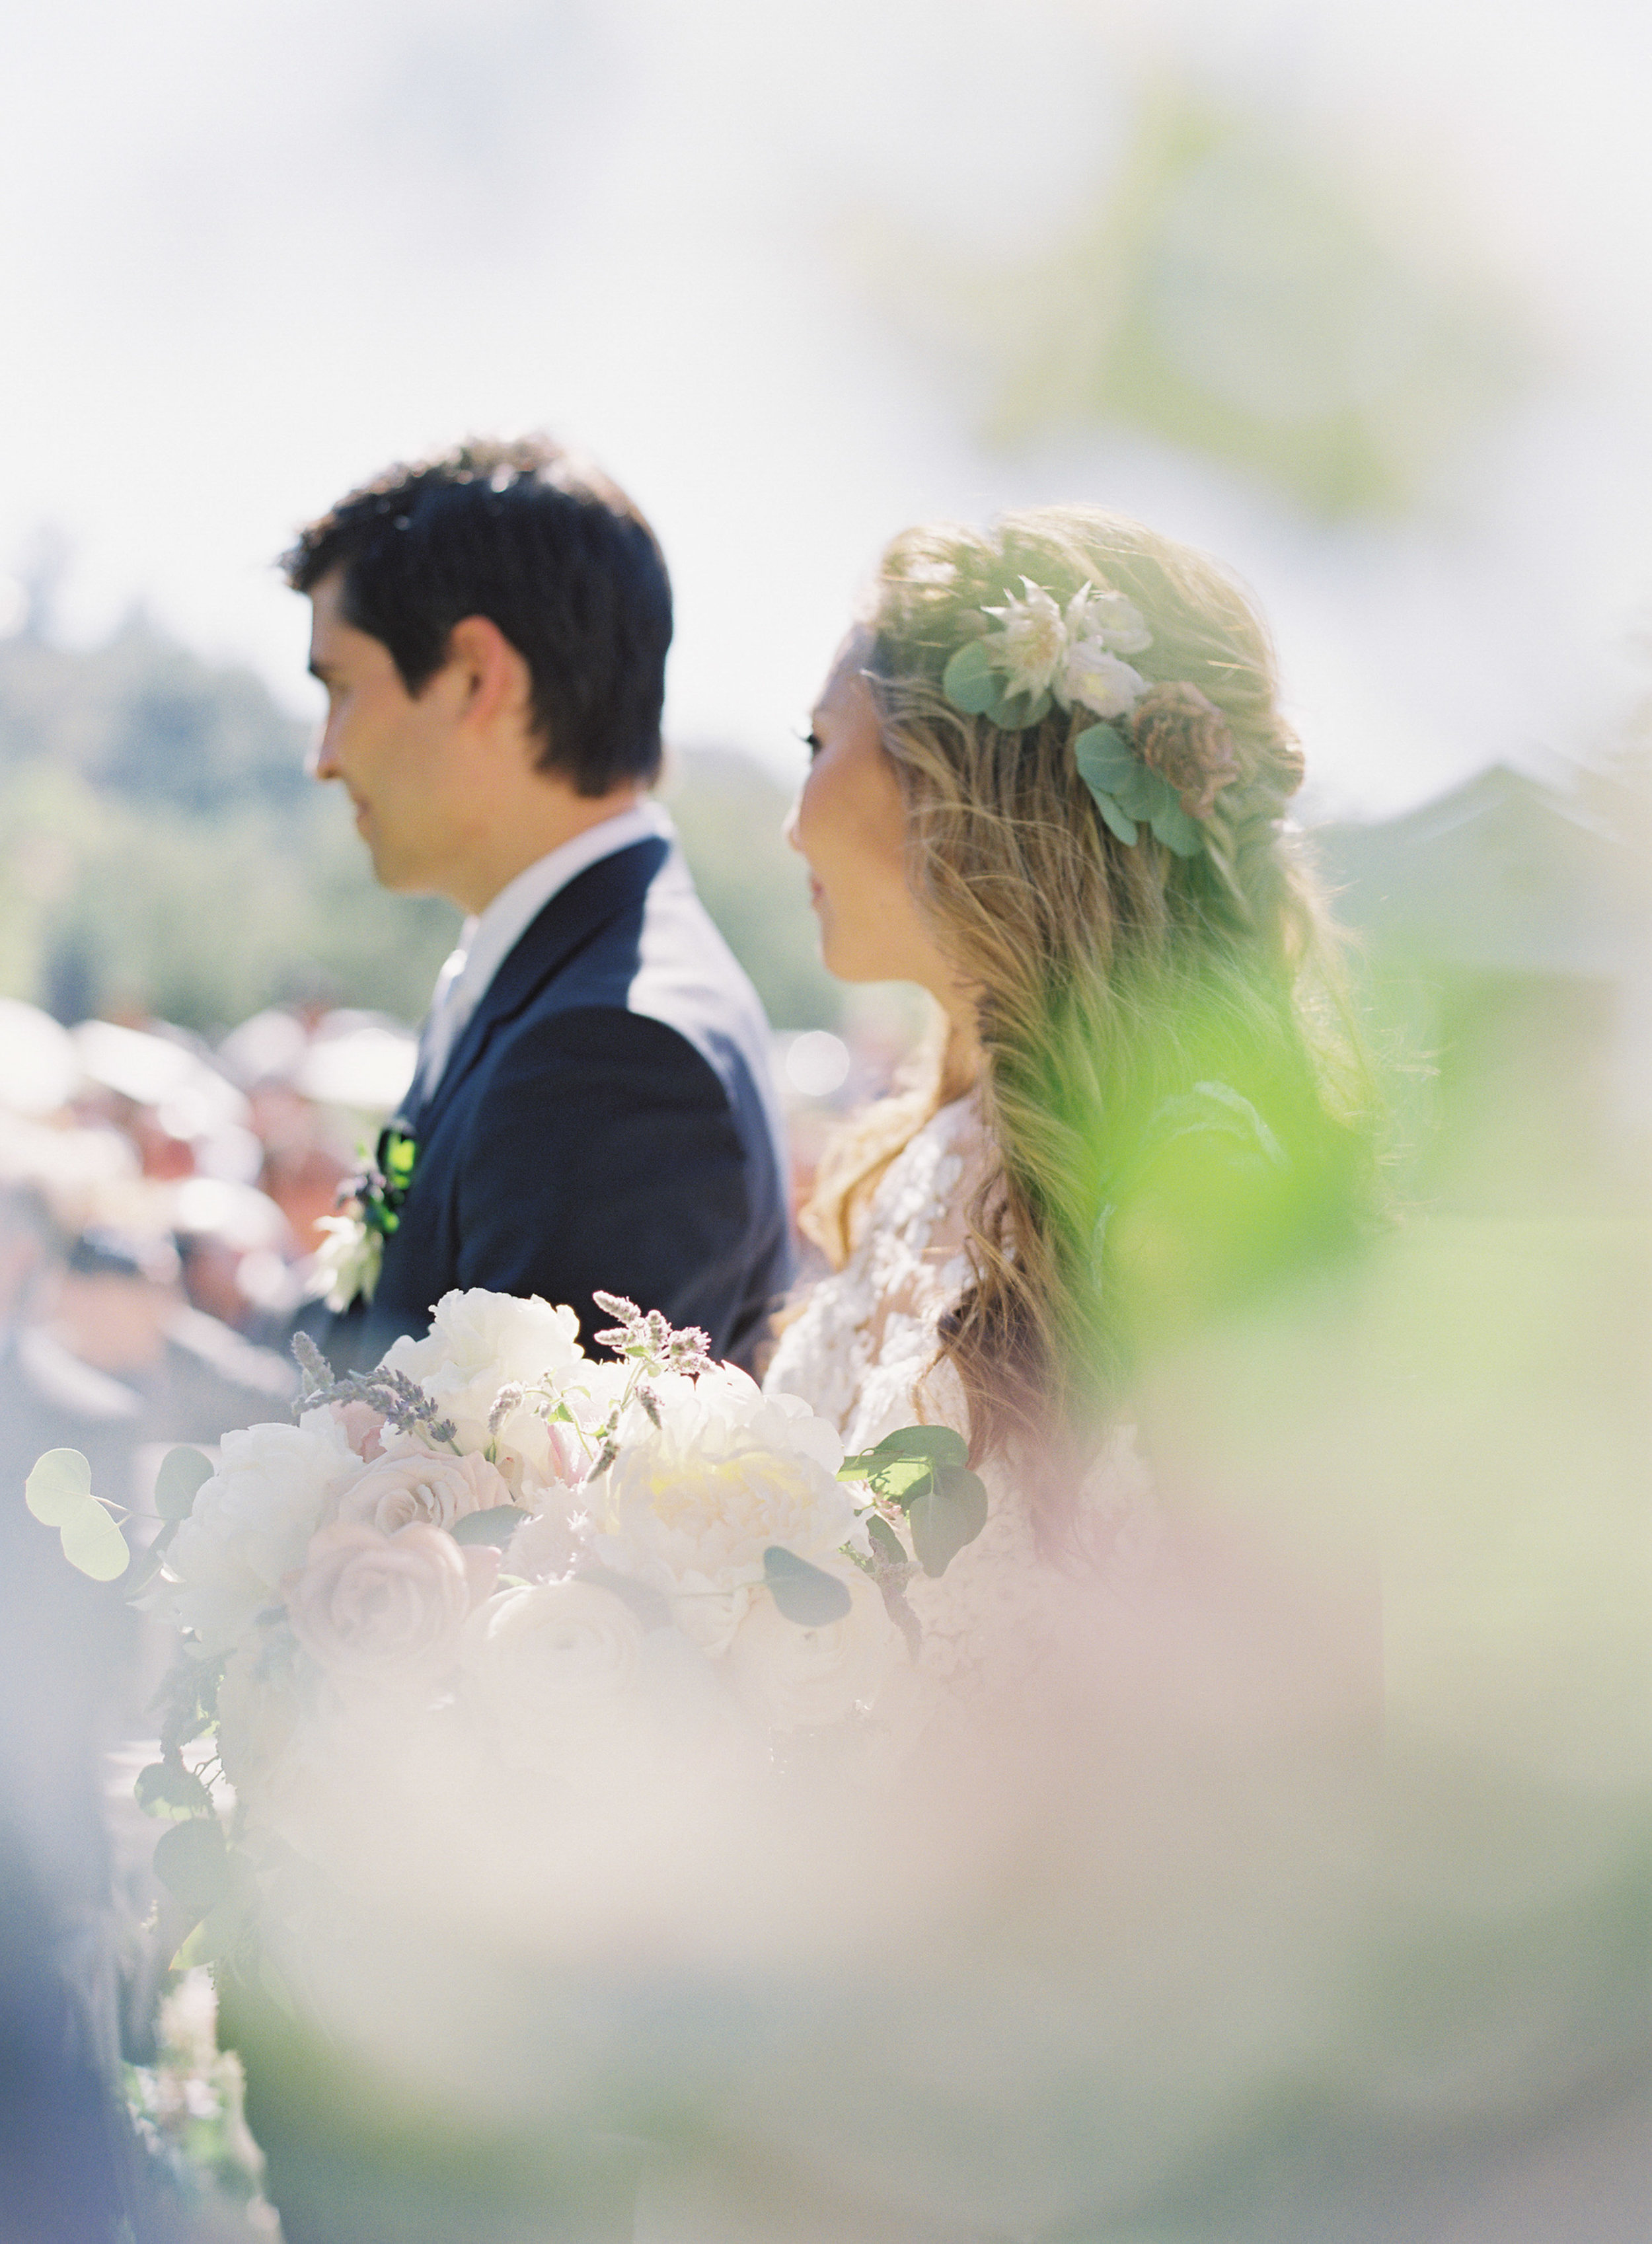 Triunfo_Creek_Winery_Wedding-77-Jen-Huang-JL-502-Jen-Huang-009976-R1-007.jpg